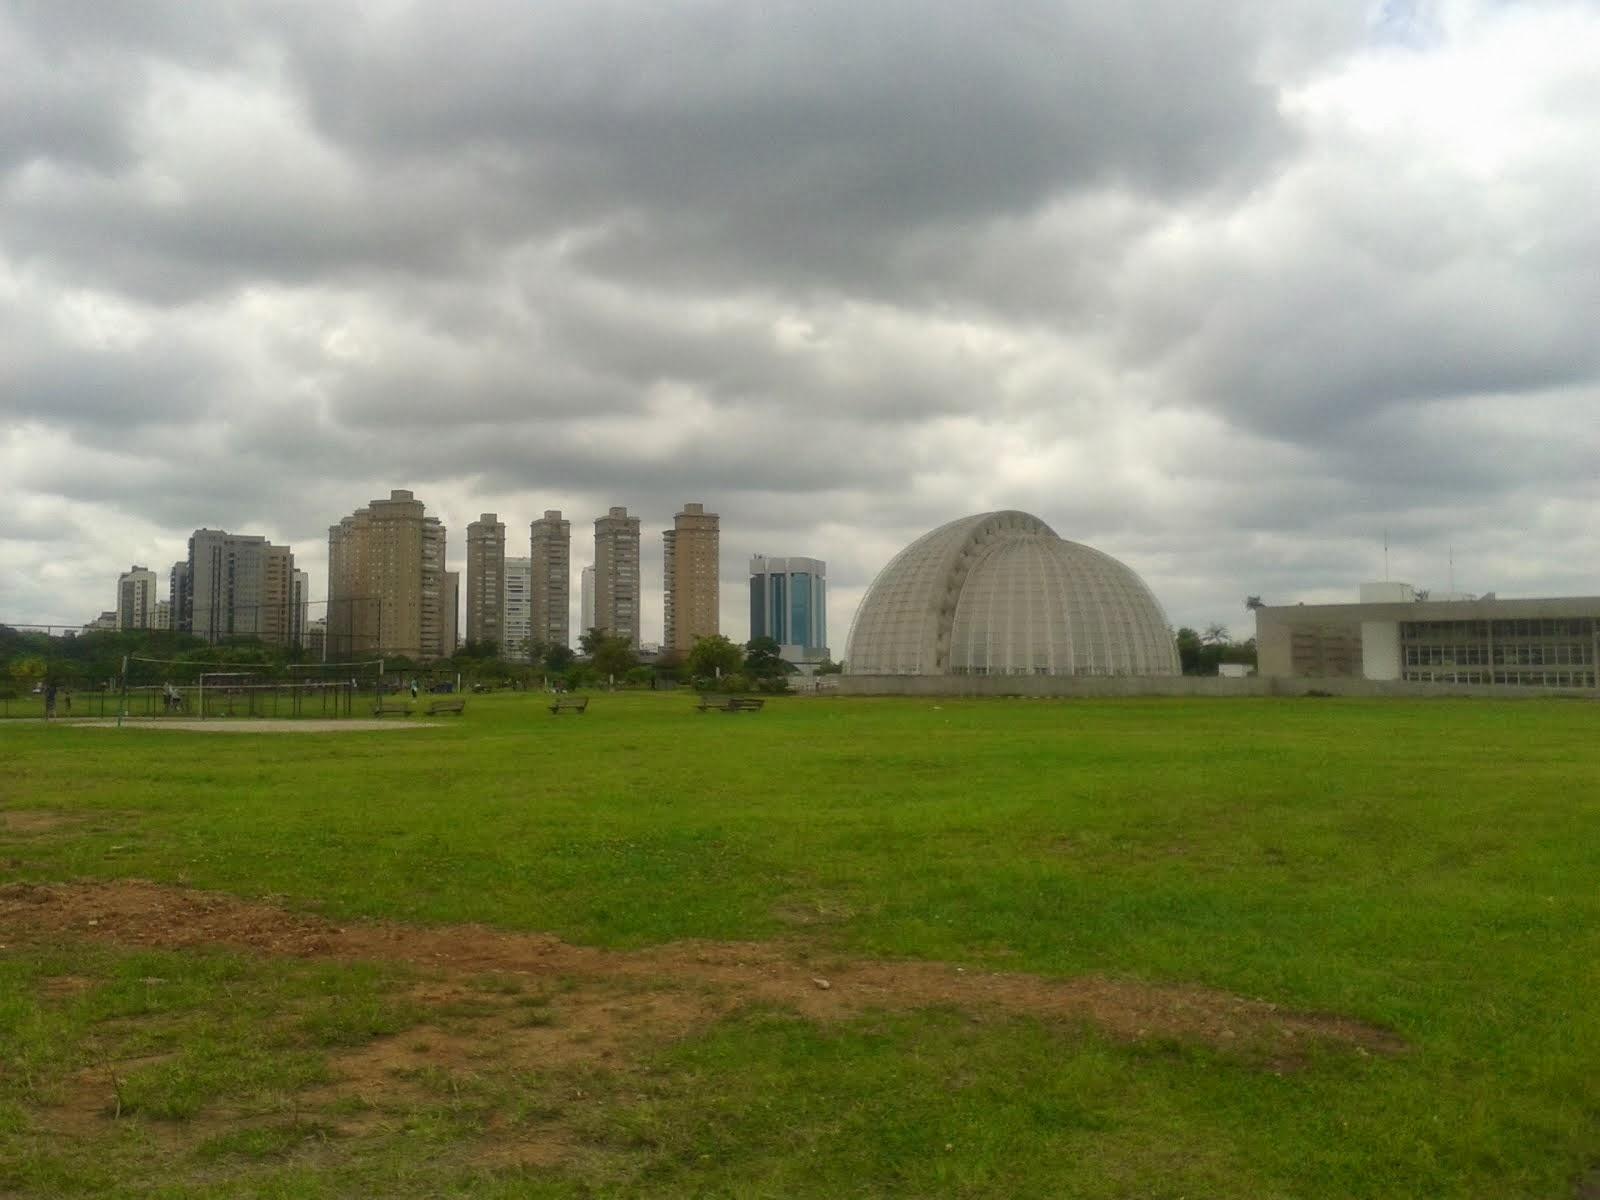 PARQUE VILAS LOBOS -SÃO PAULO